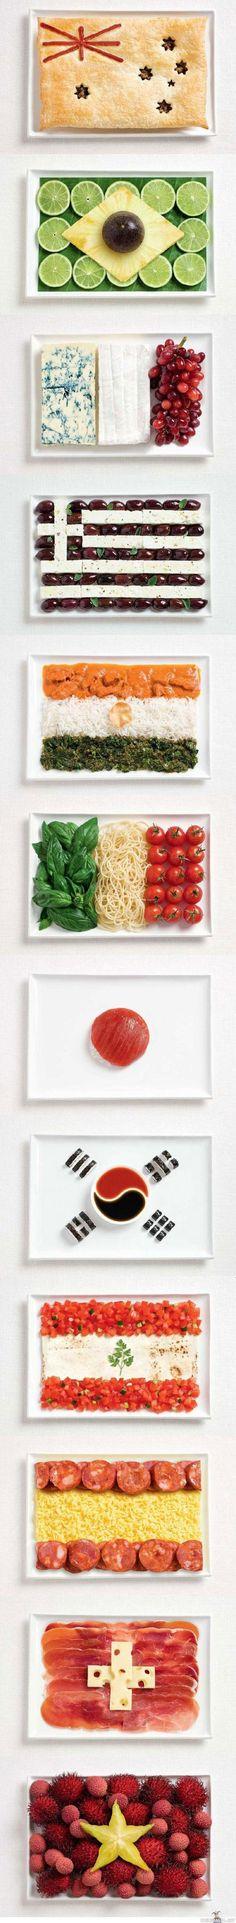 Flag plates, enjoy! #food #world